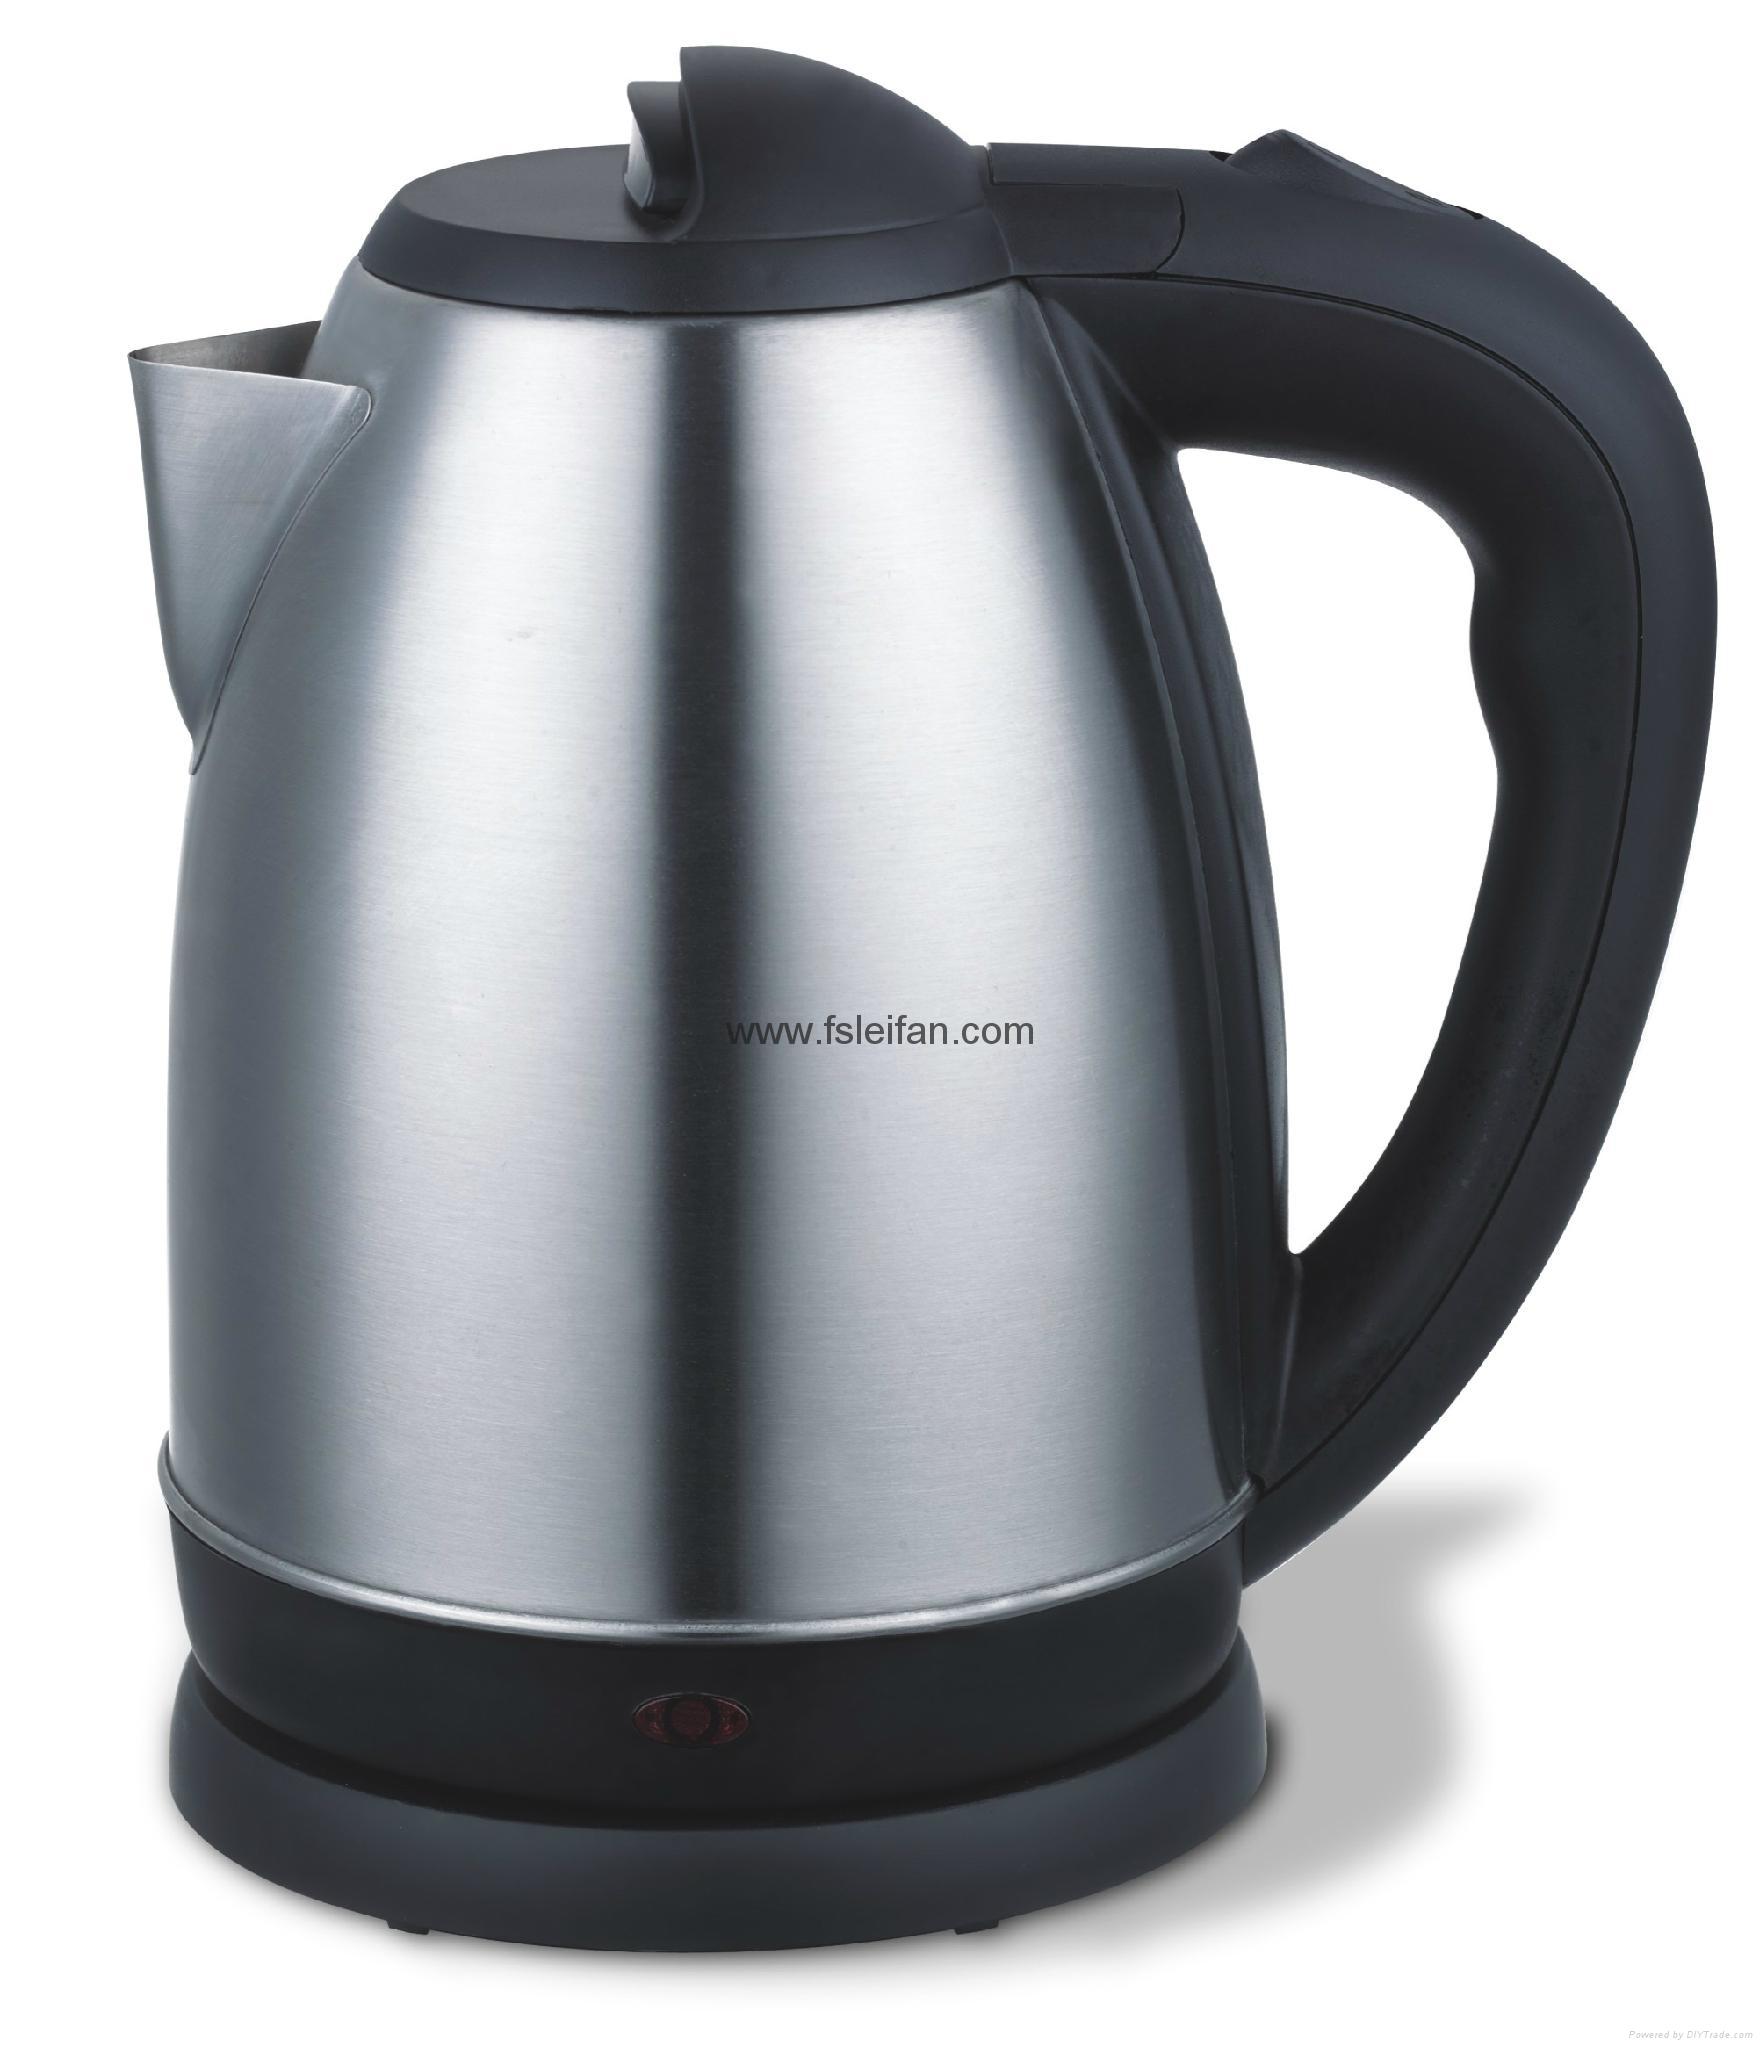 1.2L,1.5L,1.8L housing electrical kettle 4